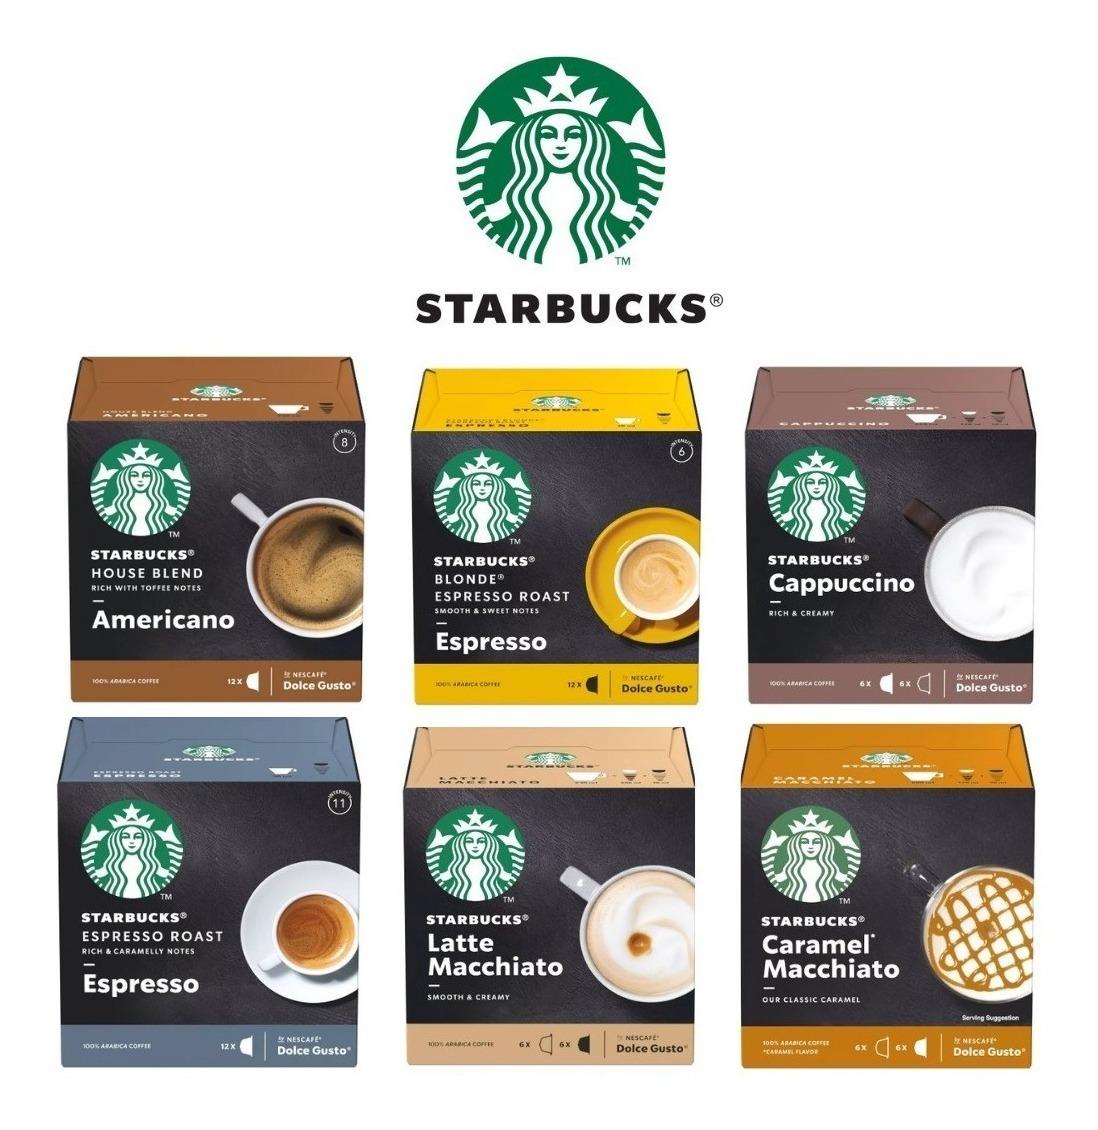 Dolce Gusto - Cápsulas Starbucks por R$22,50